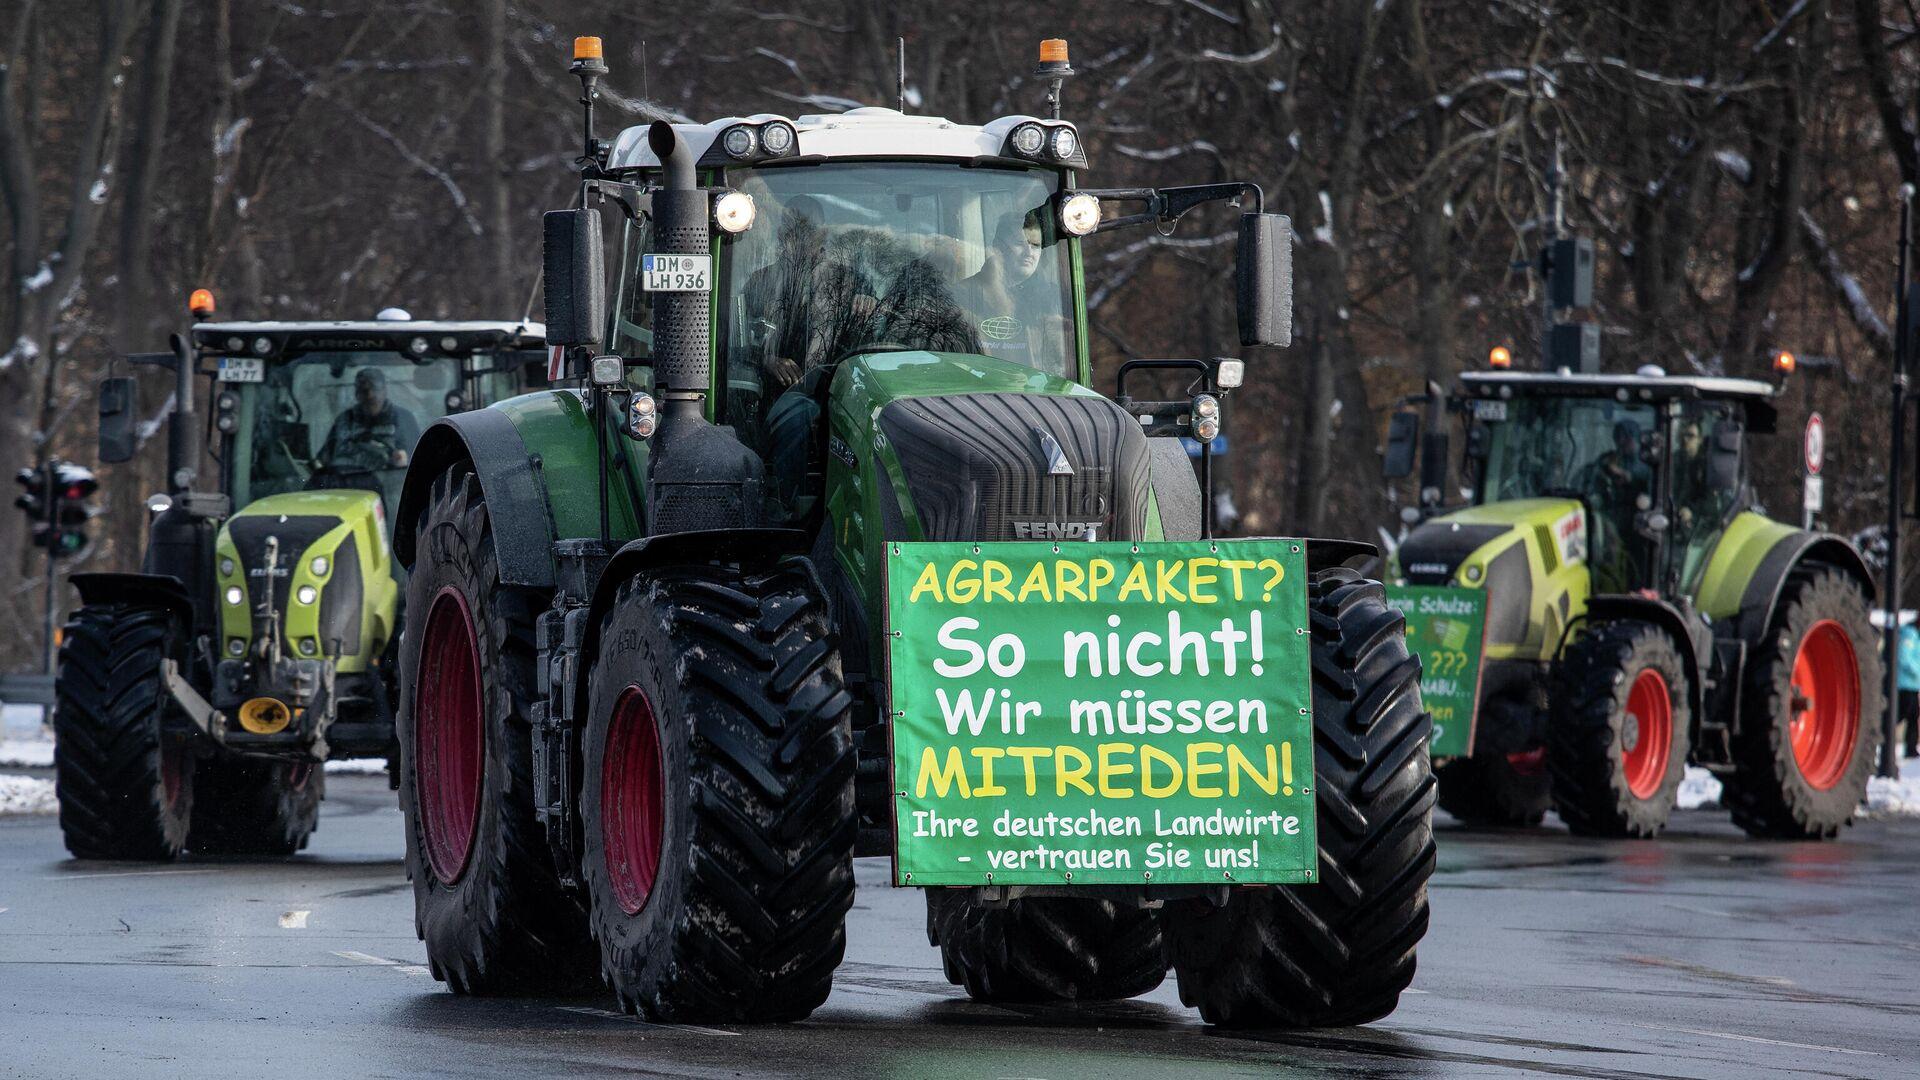 Bauernproteste gegen das Agrarpaket der Bundesregierung. Berlin, Februar 2021 - SNA, 1920, 23.03.2021